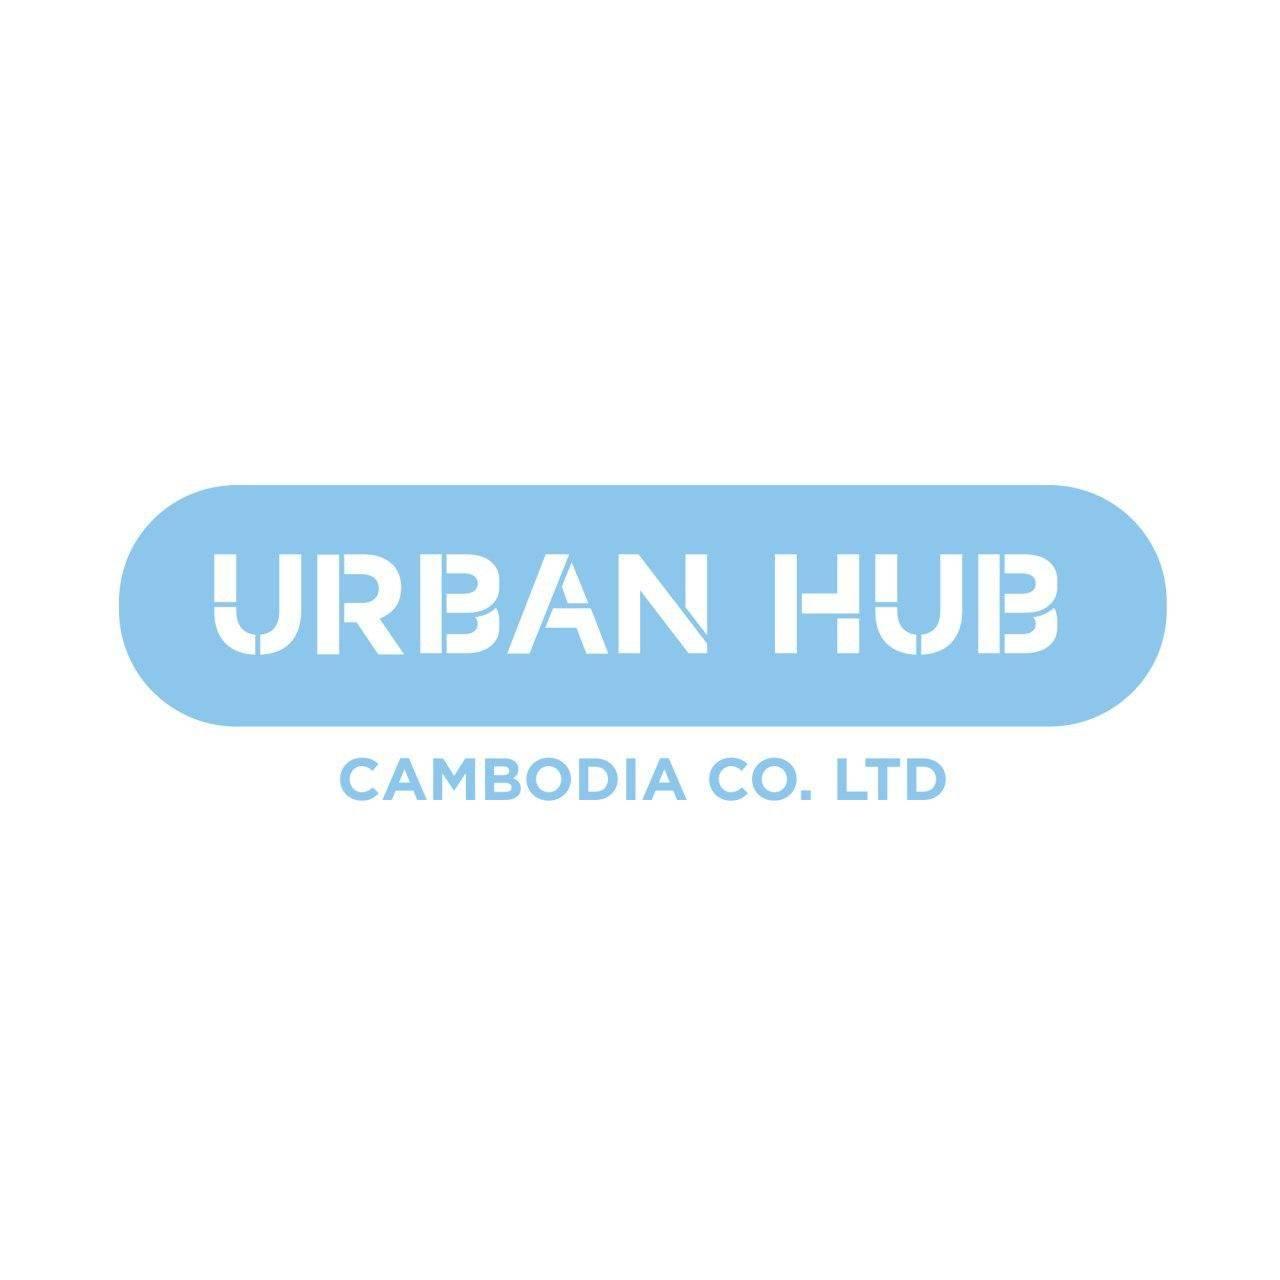 URBAN HUB CAMBODIA CO.,LTD